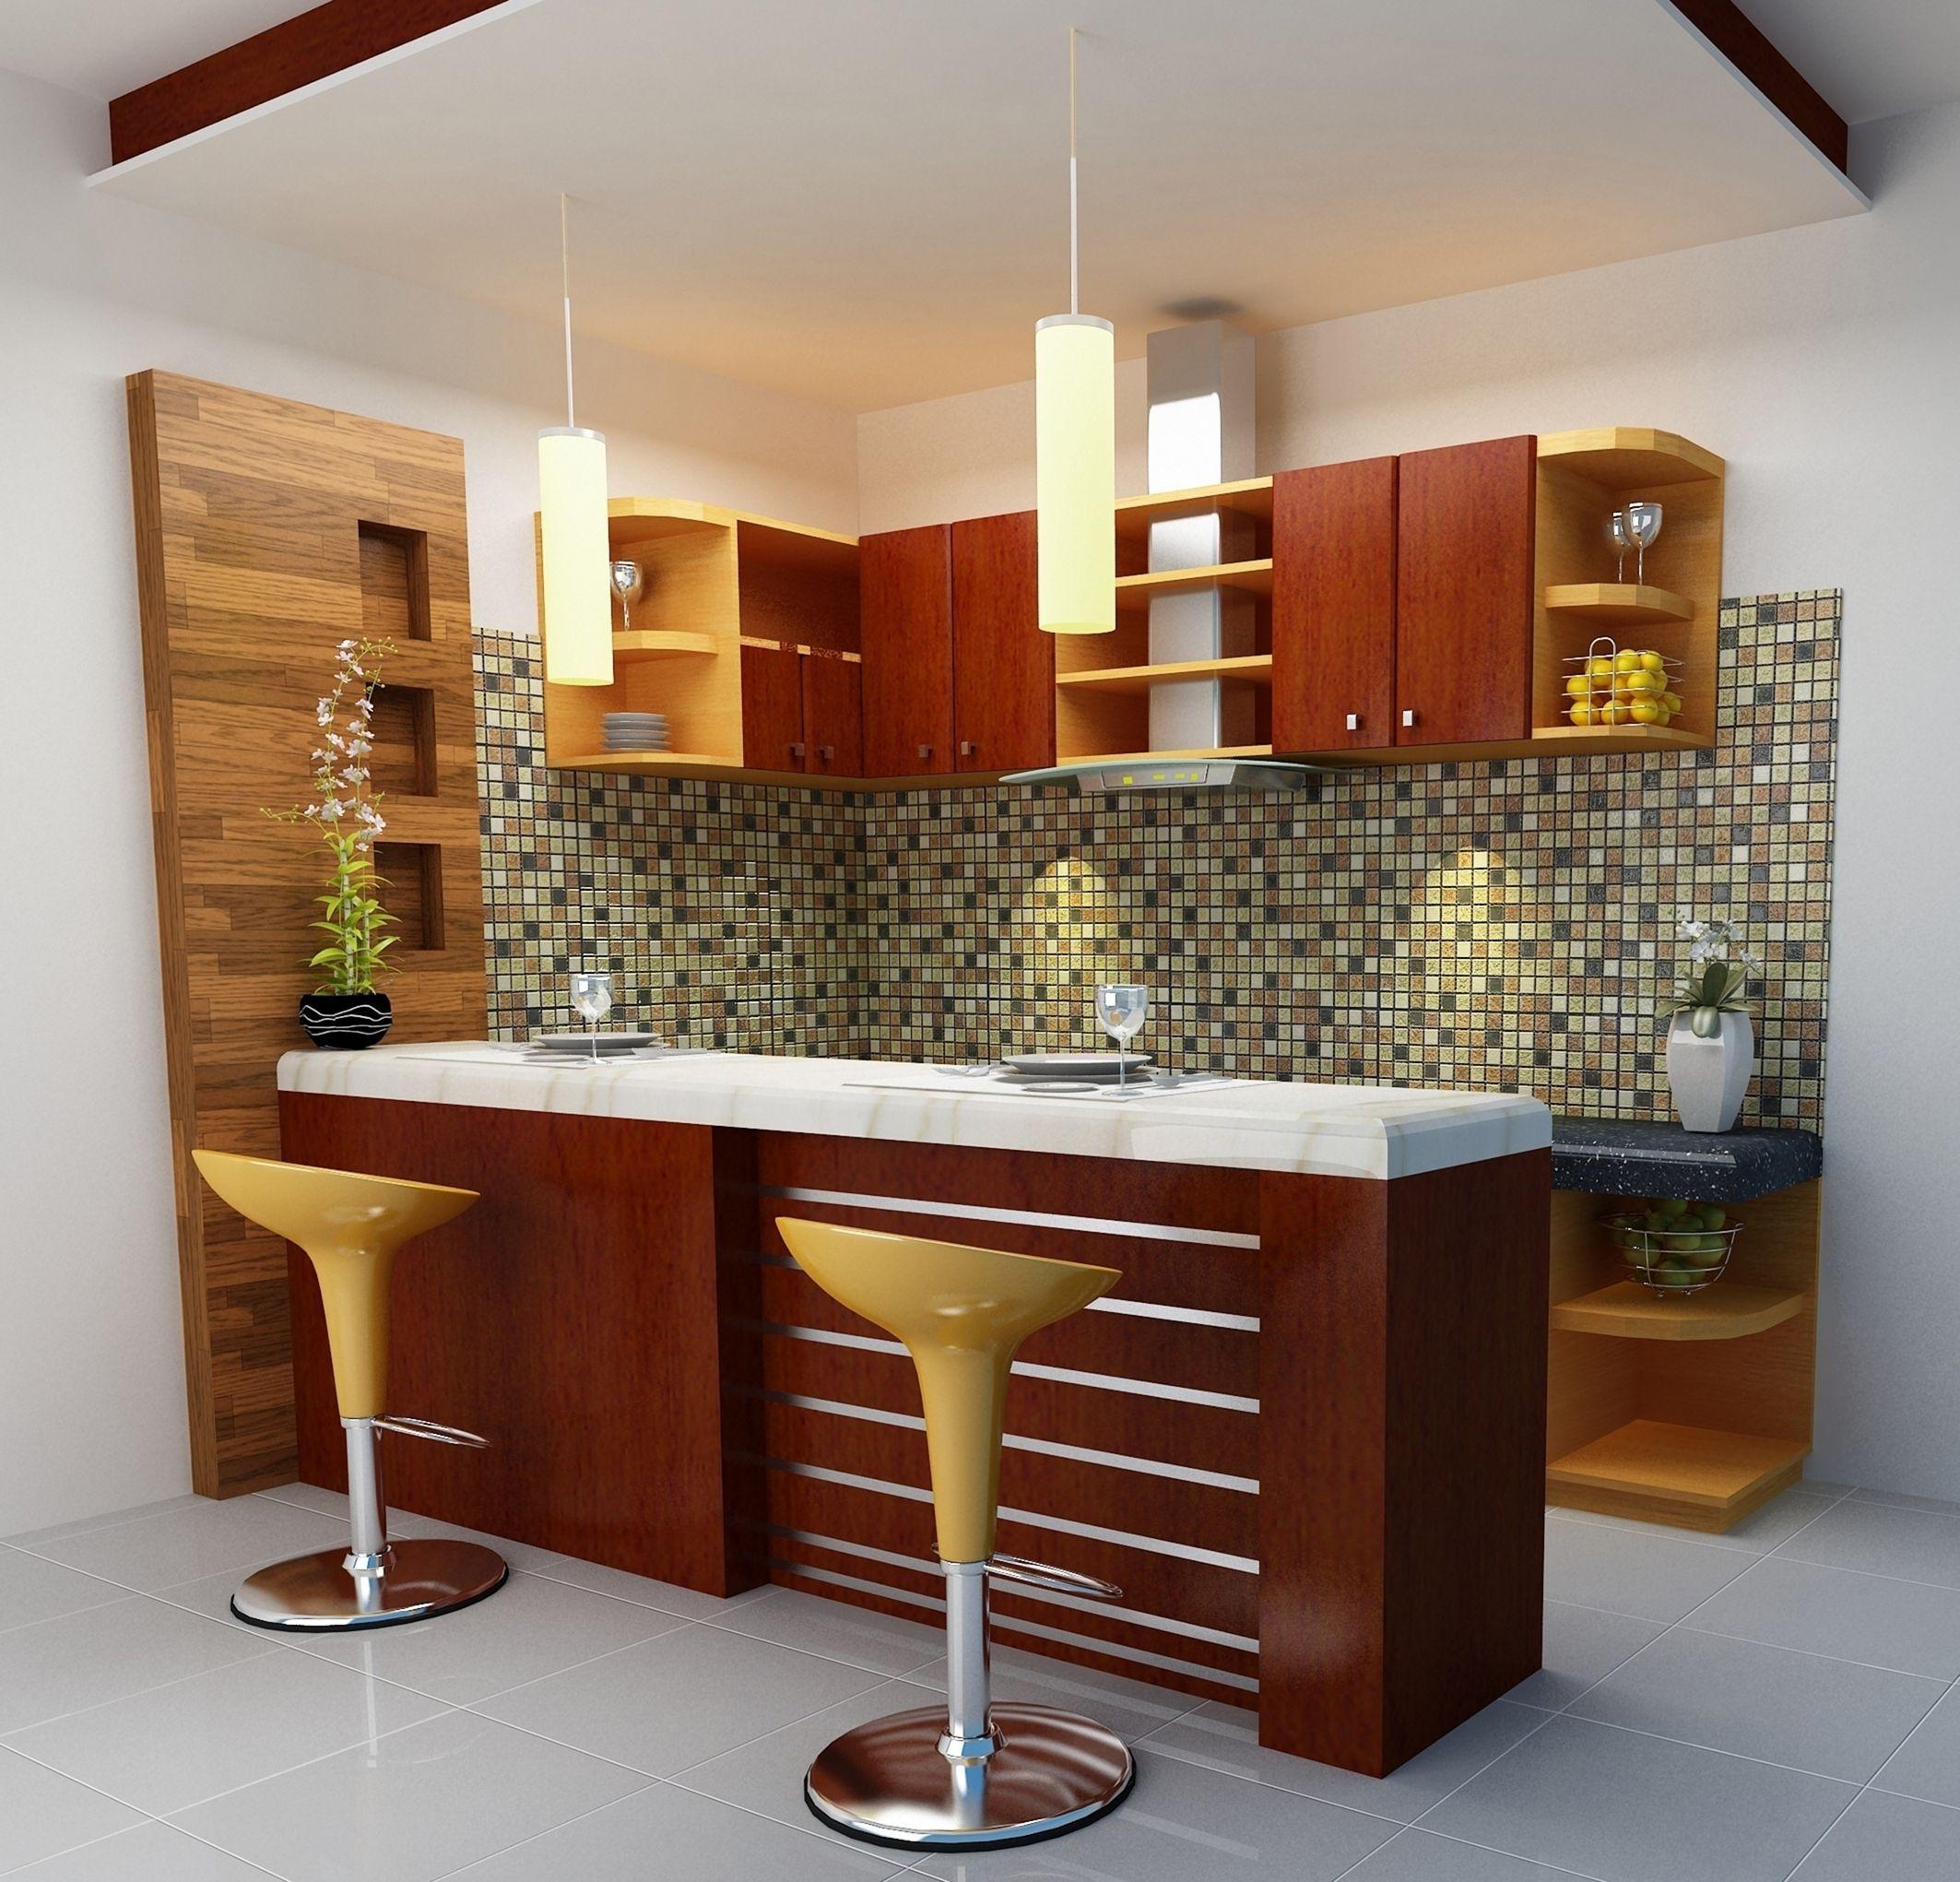 27 Fabulous Home Mini Bar Kitchen Designs For Amazing Kitchen Idea